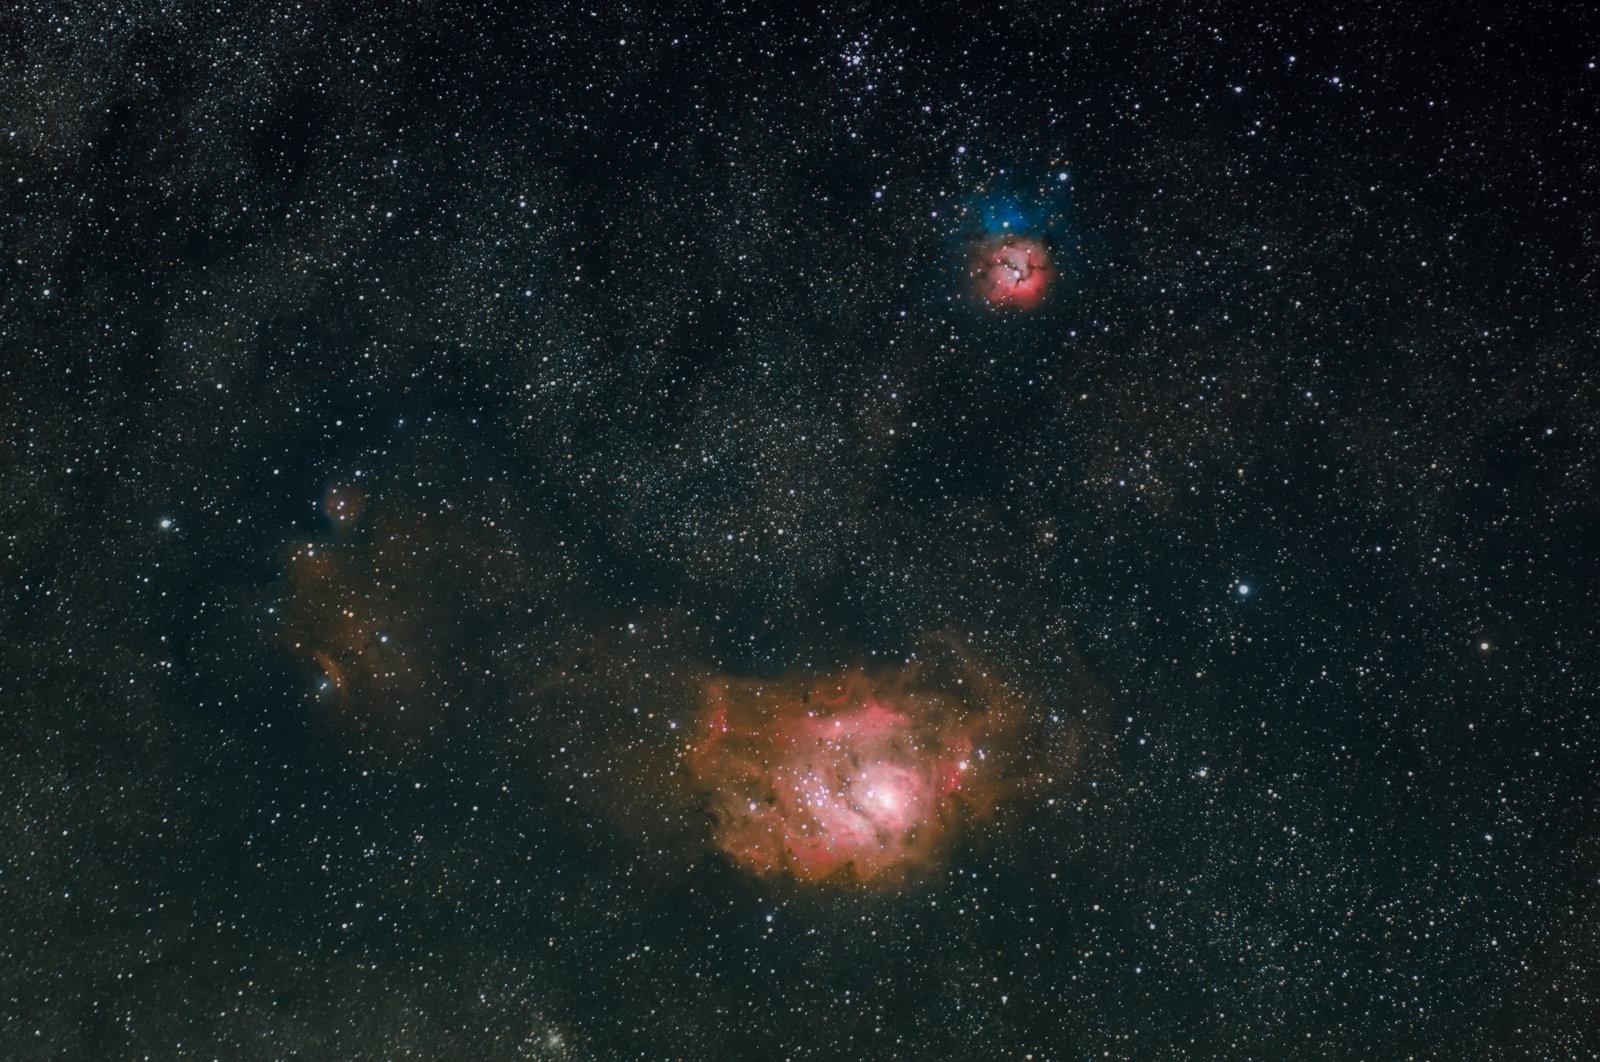 NGC6526small_v2.thumb.jpg.d2c7b761b7608b9bfeeaff155c476f2a.jpg